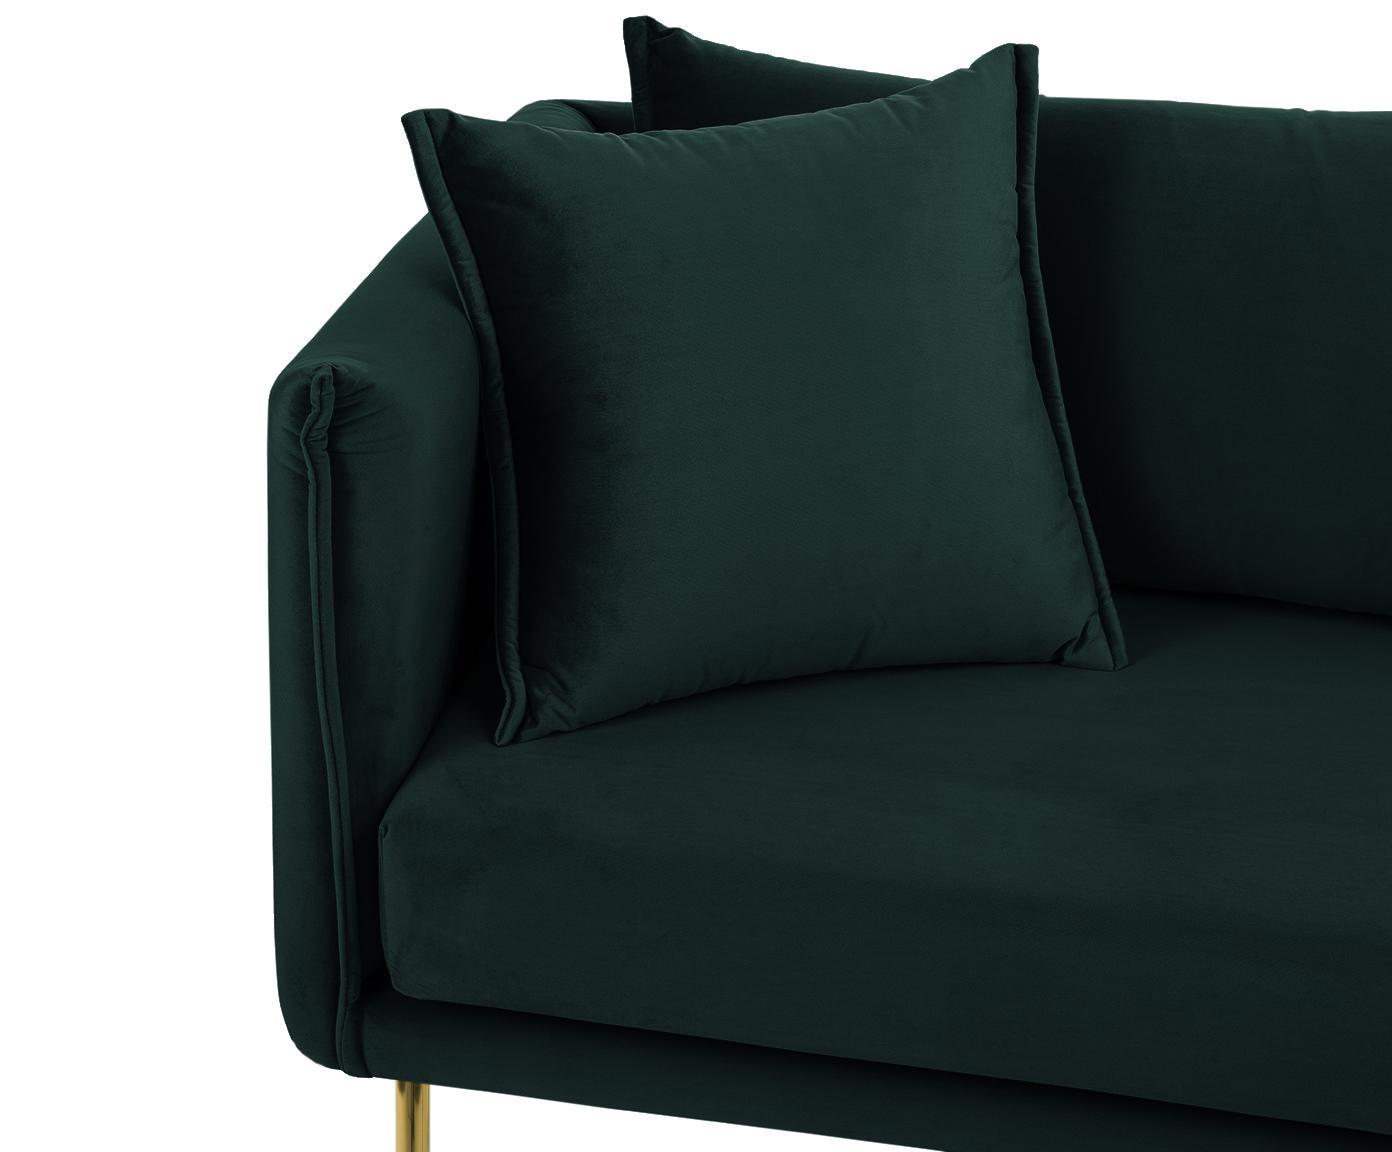 Samt-Sofa Ivy (2-Sitzer), Bezug: Samt (Polyester) 15.000 S, Gestell: Metall, Bezug: DunkelgrünBeine: Goldfarben, B 170 x T 75 cm